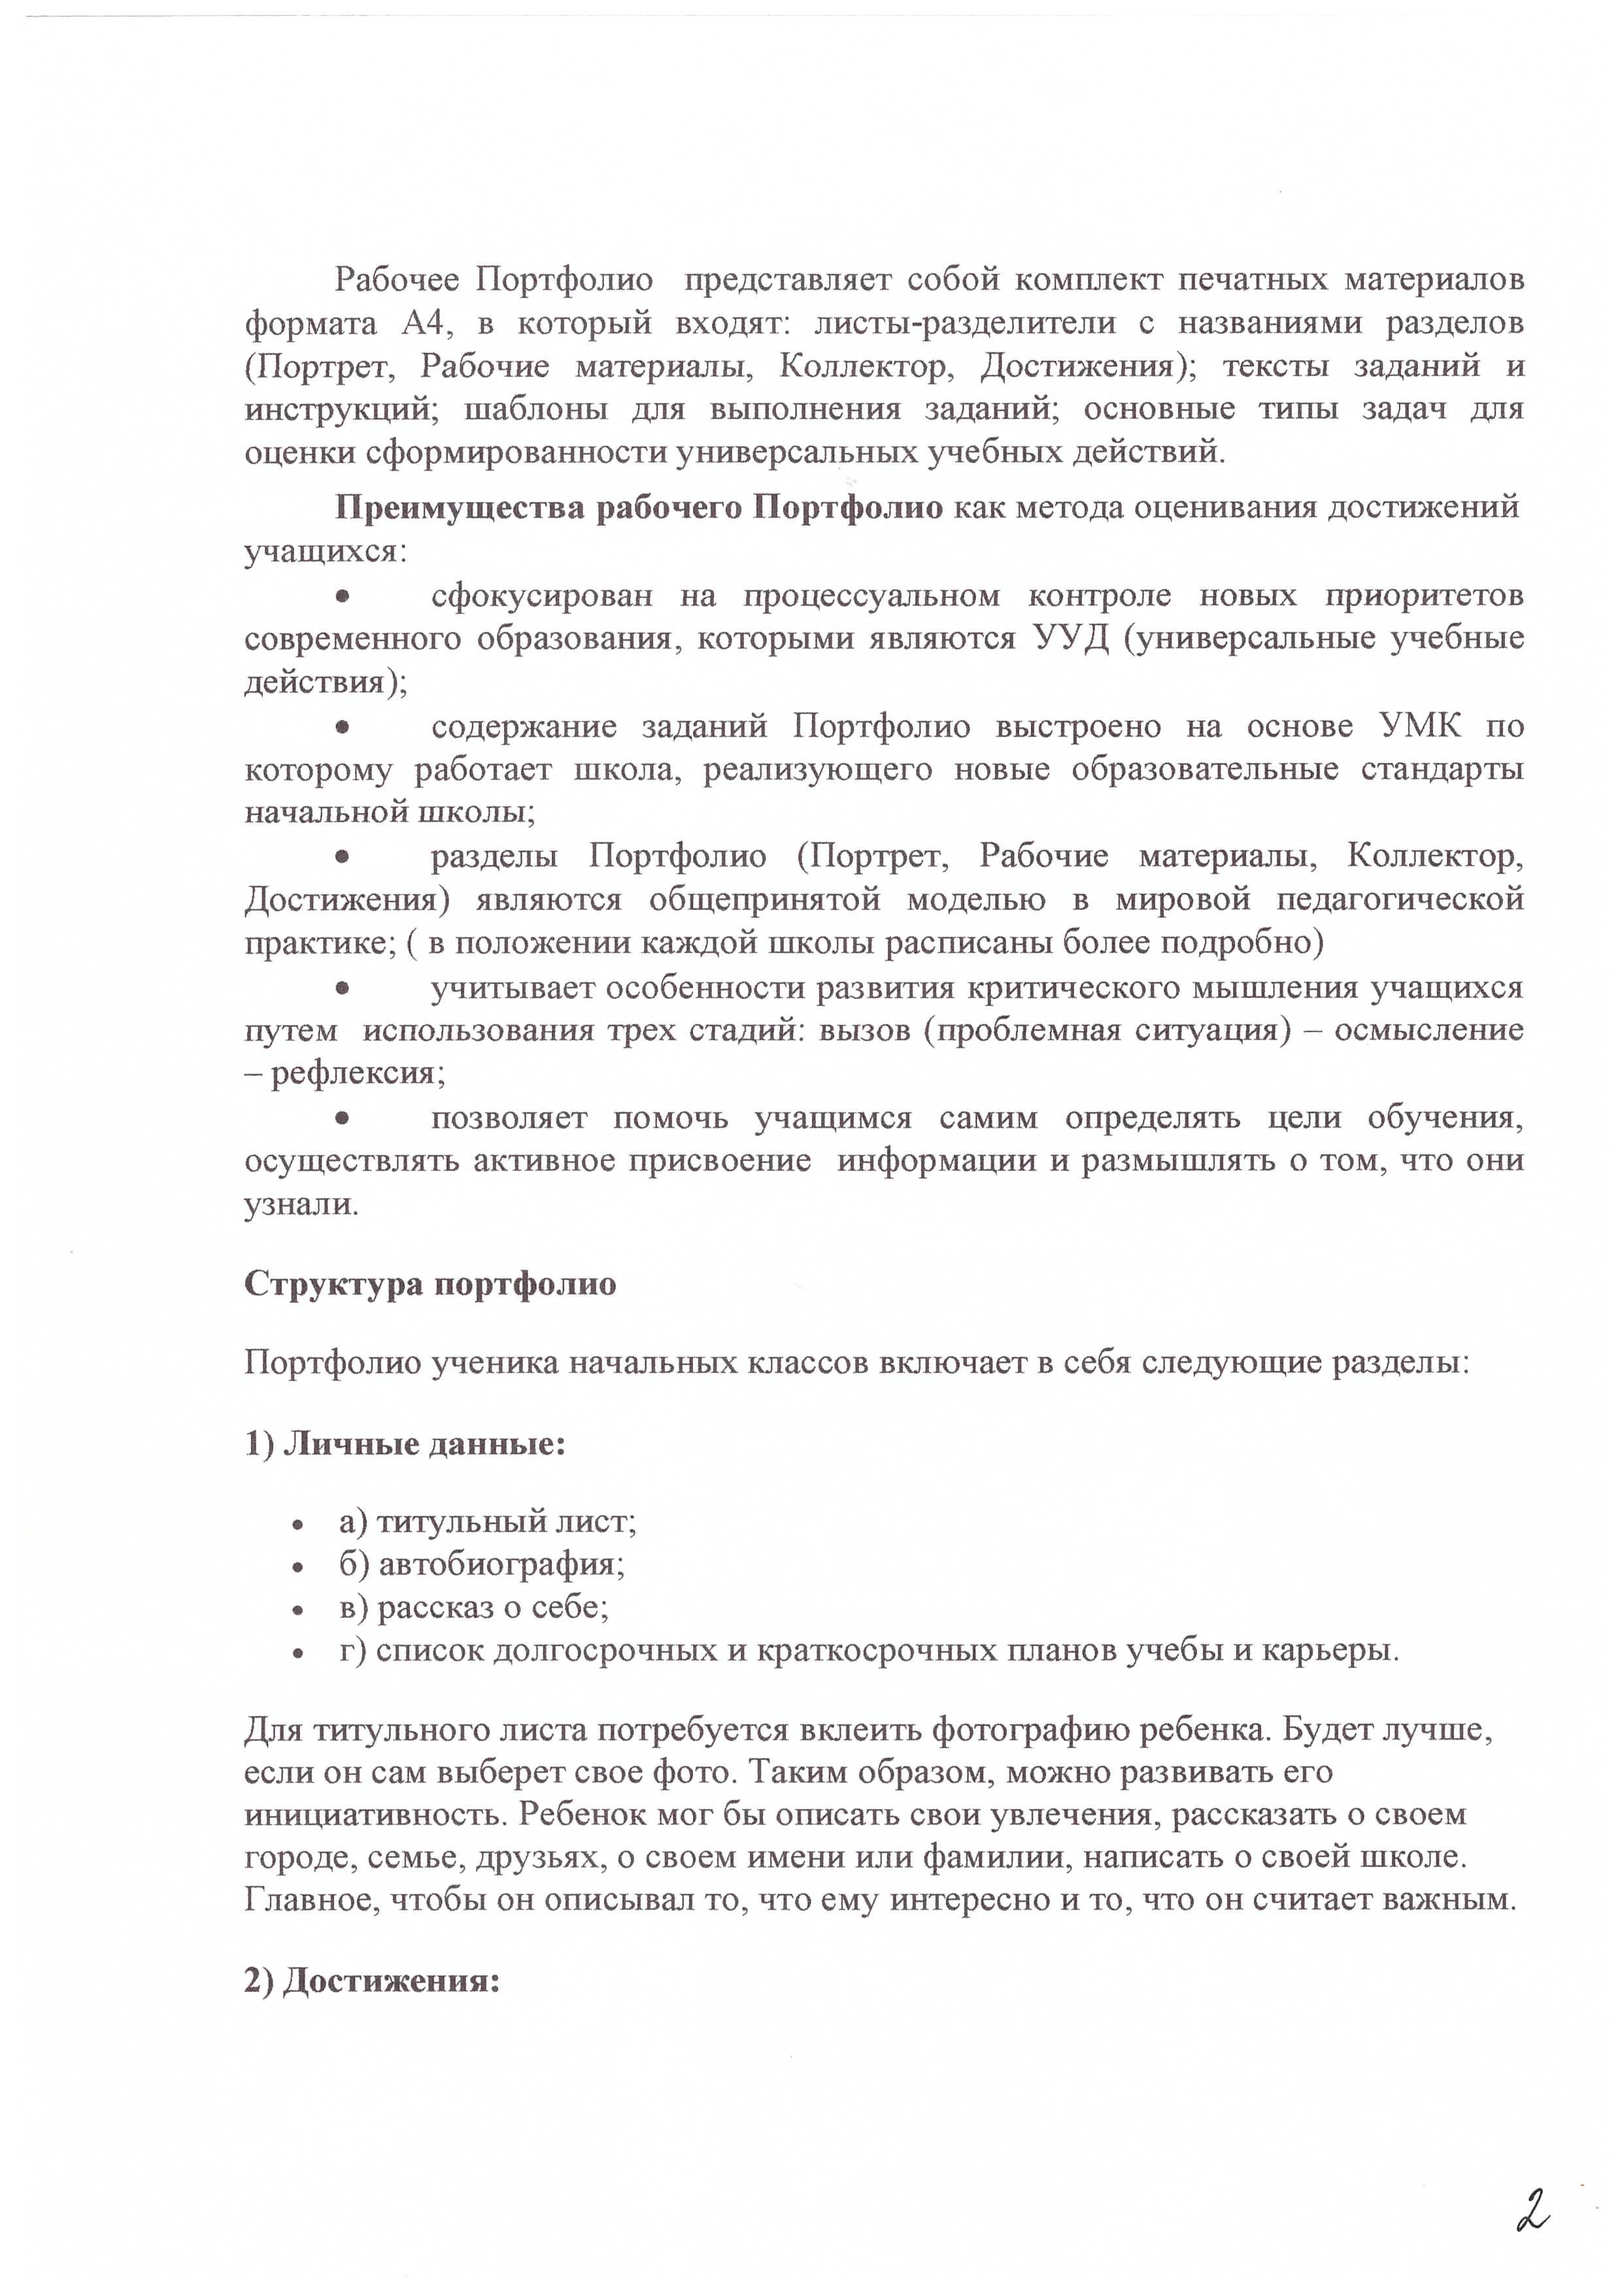 C:\Documents and Settings\Админ\Мои документы\стр.2..jpeg